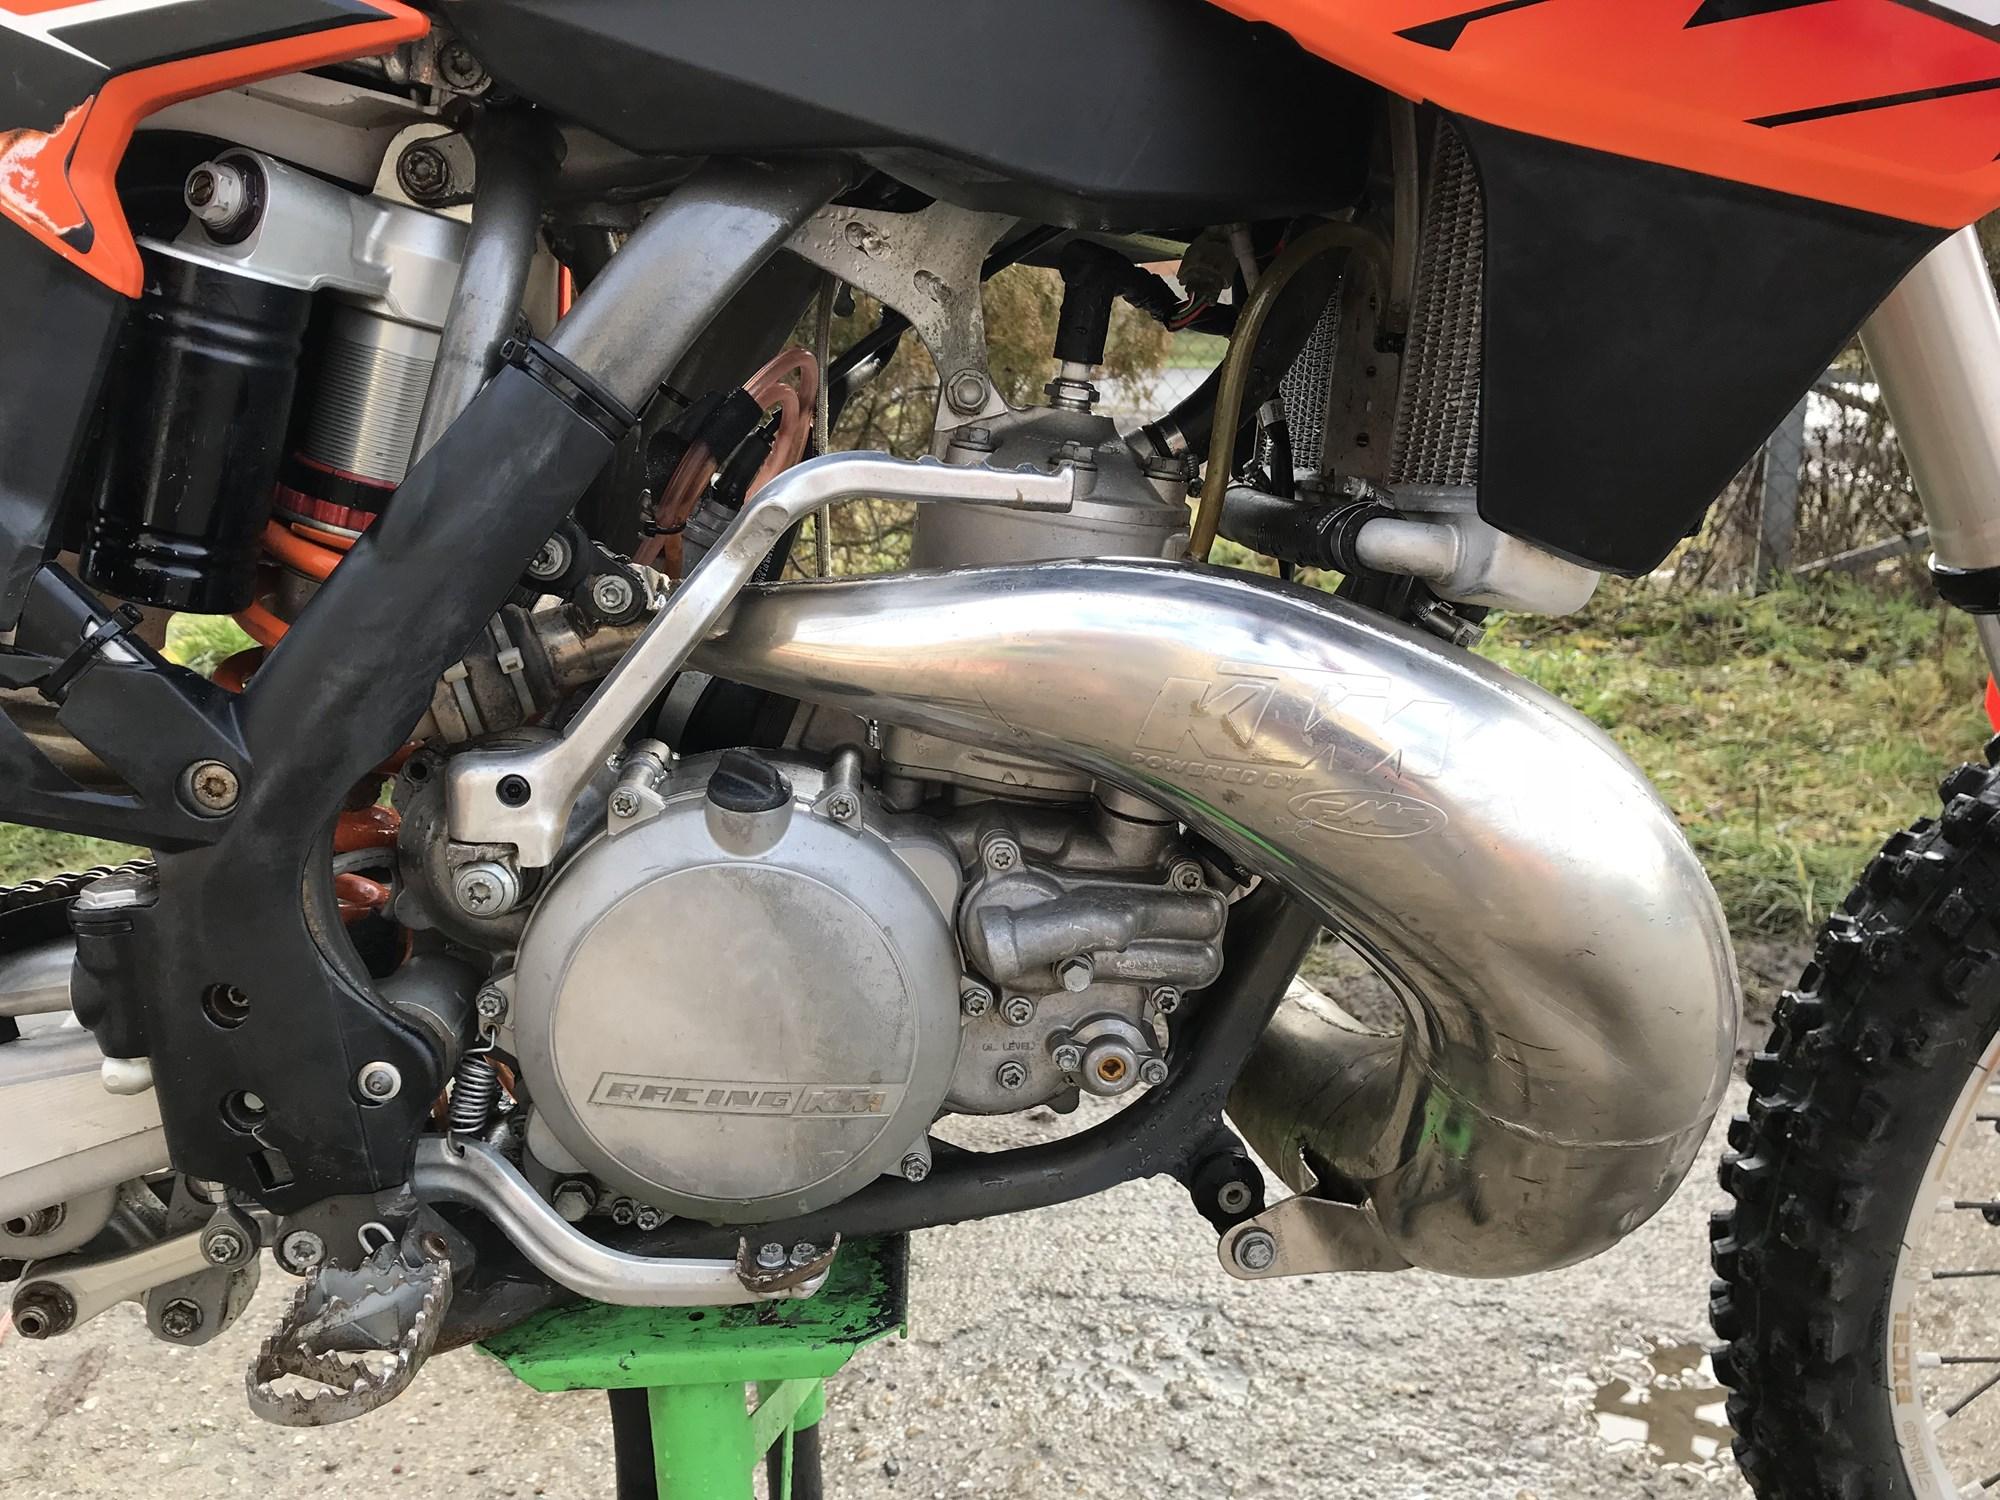 KTM SX 250, 4. kép